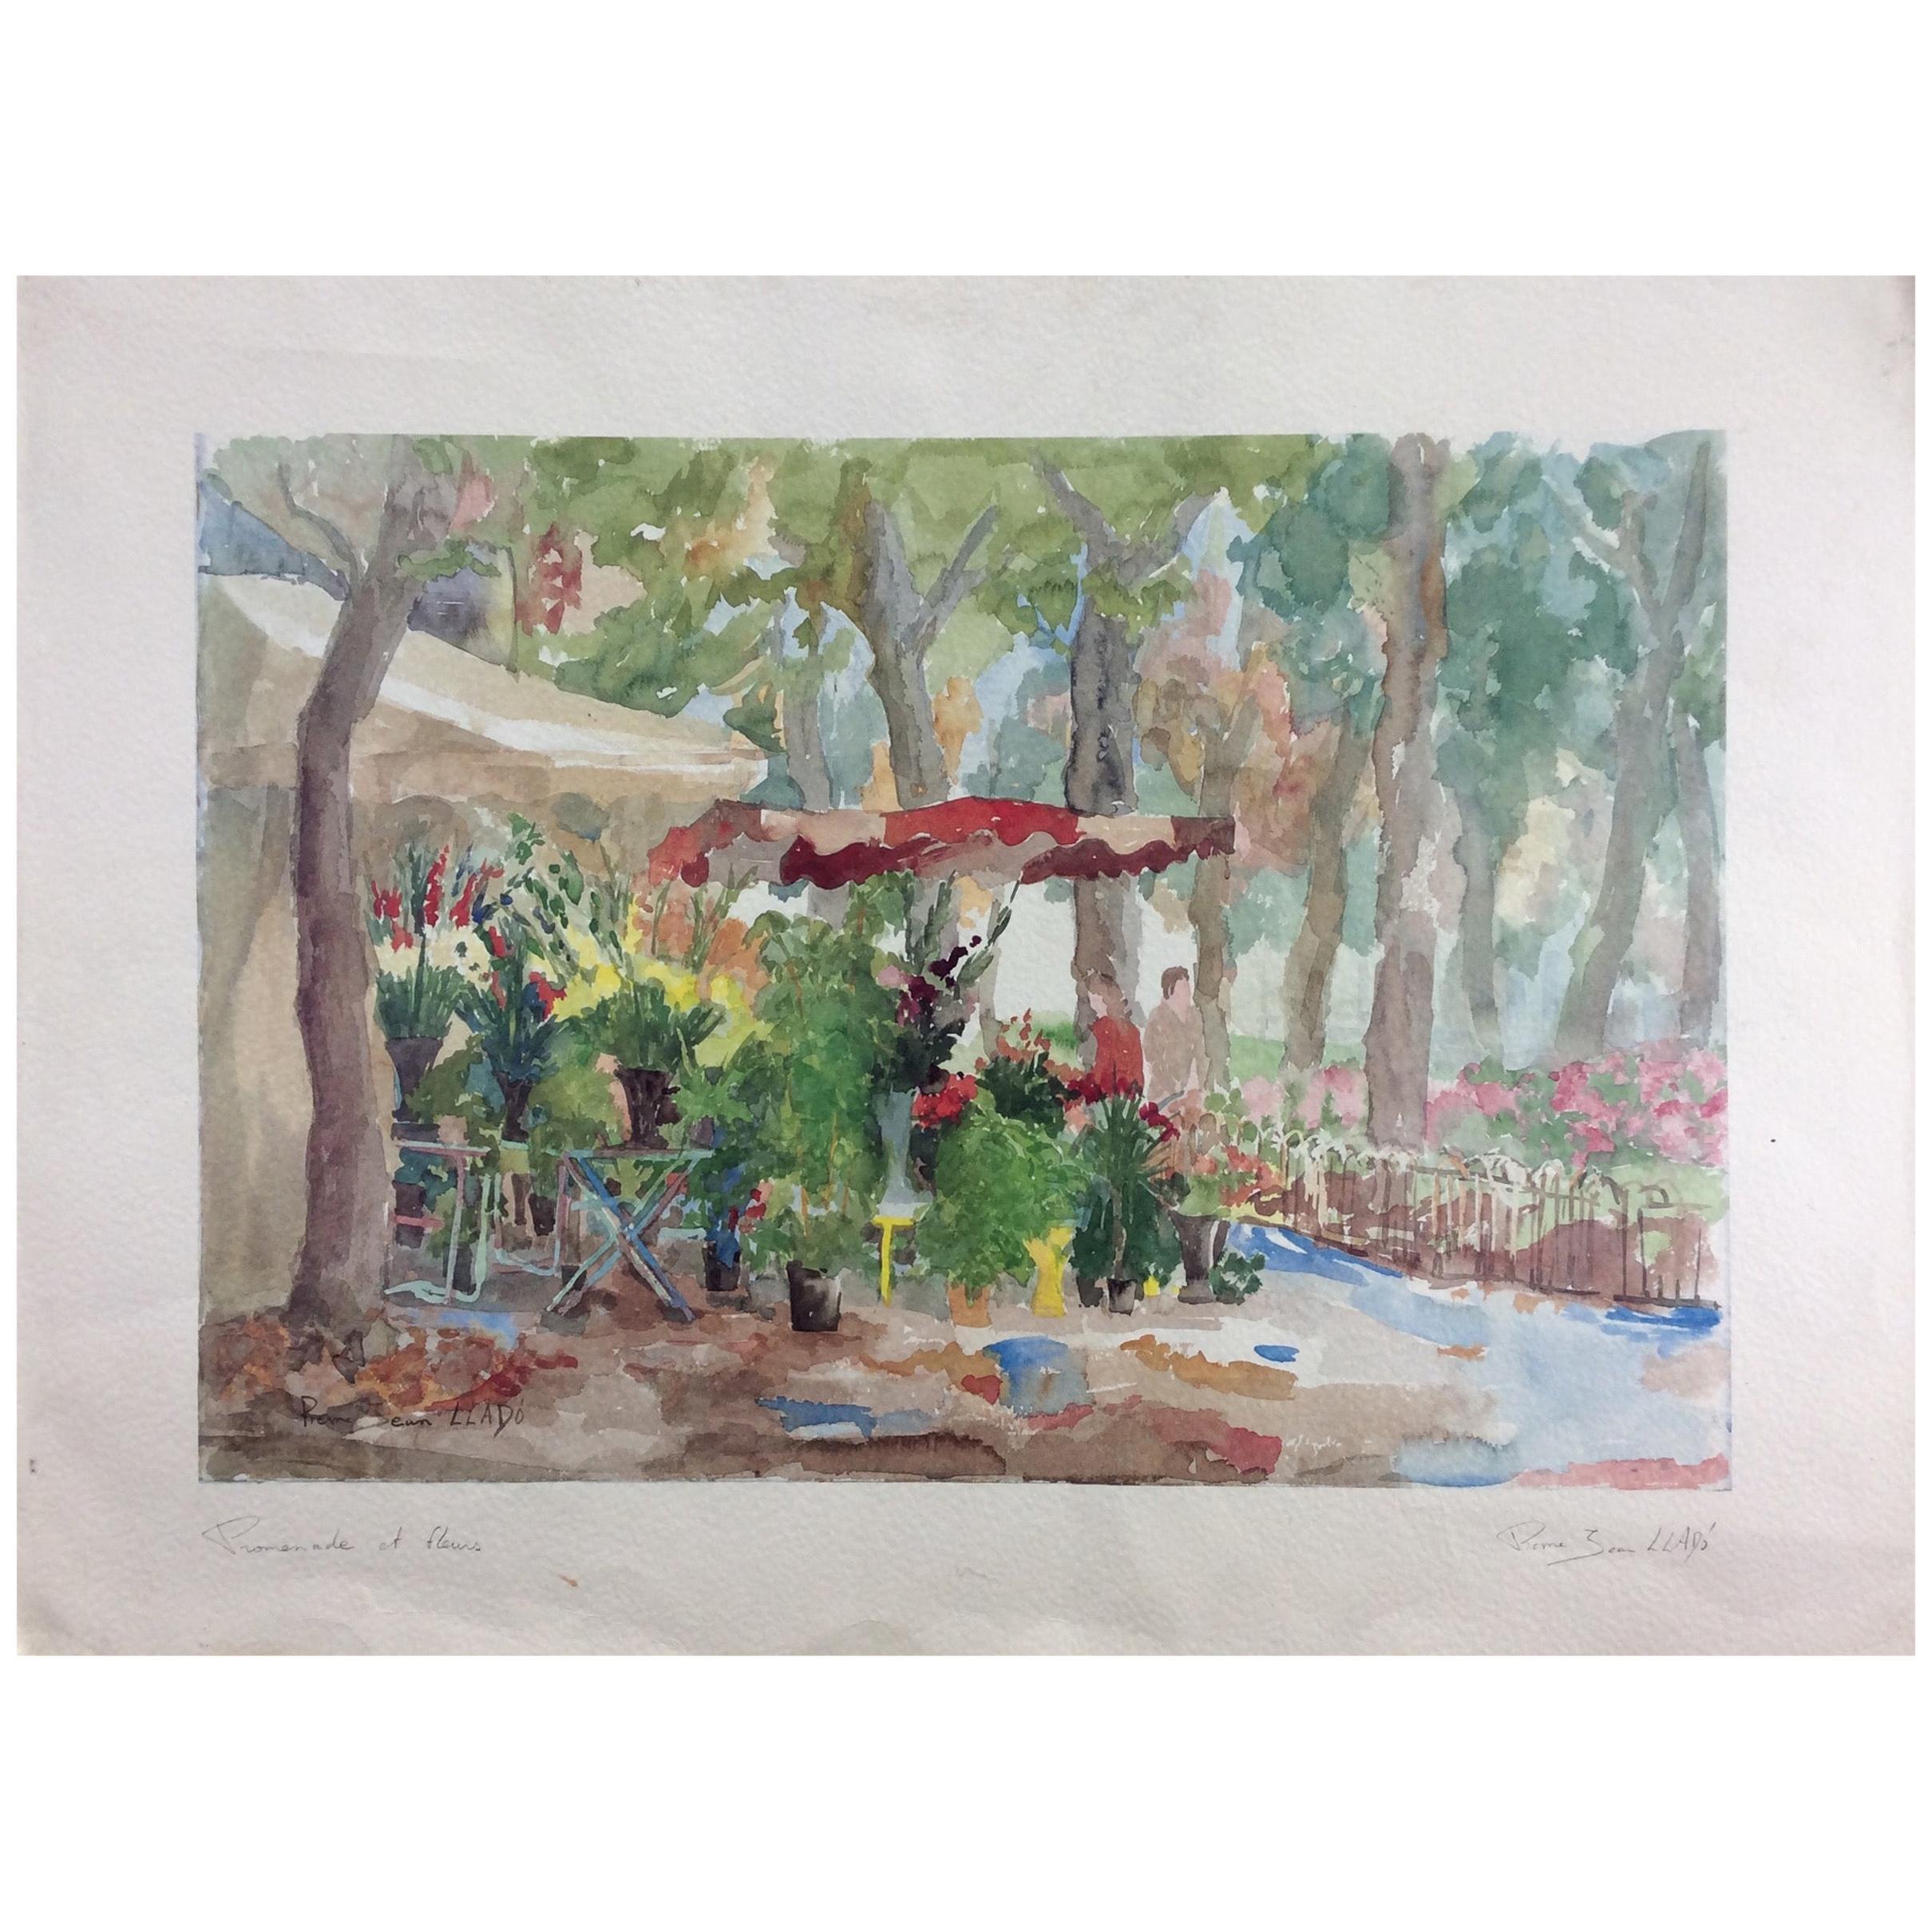 "Original French Watercolor Painting Titled ""Promenade et Fleurs"", Signed Llado"